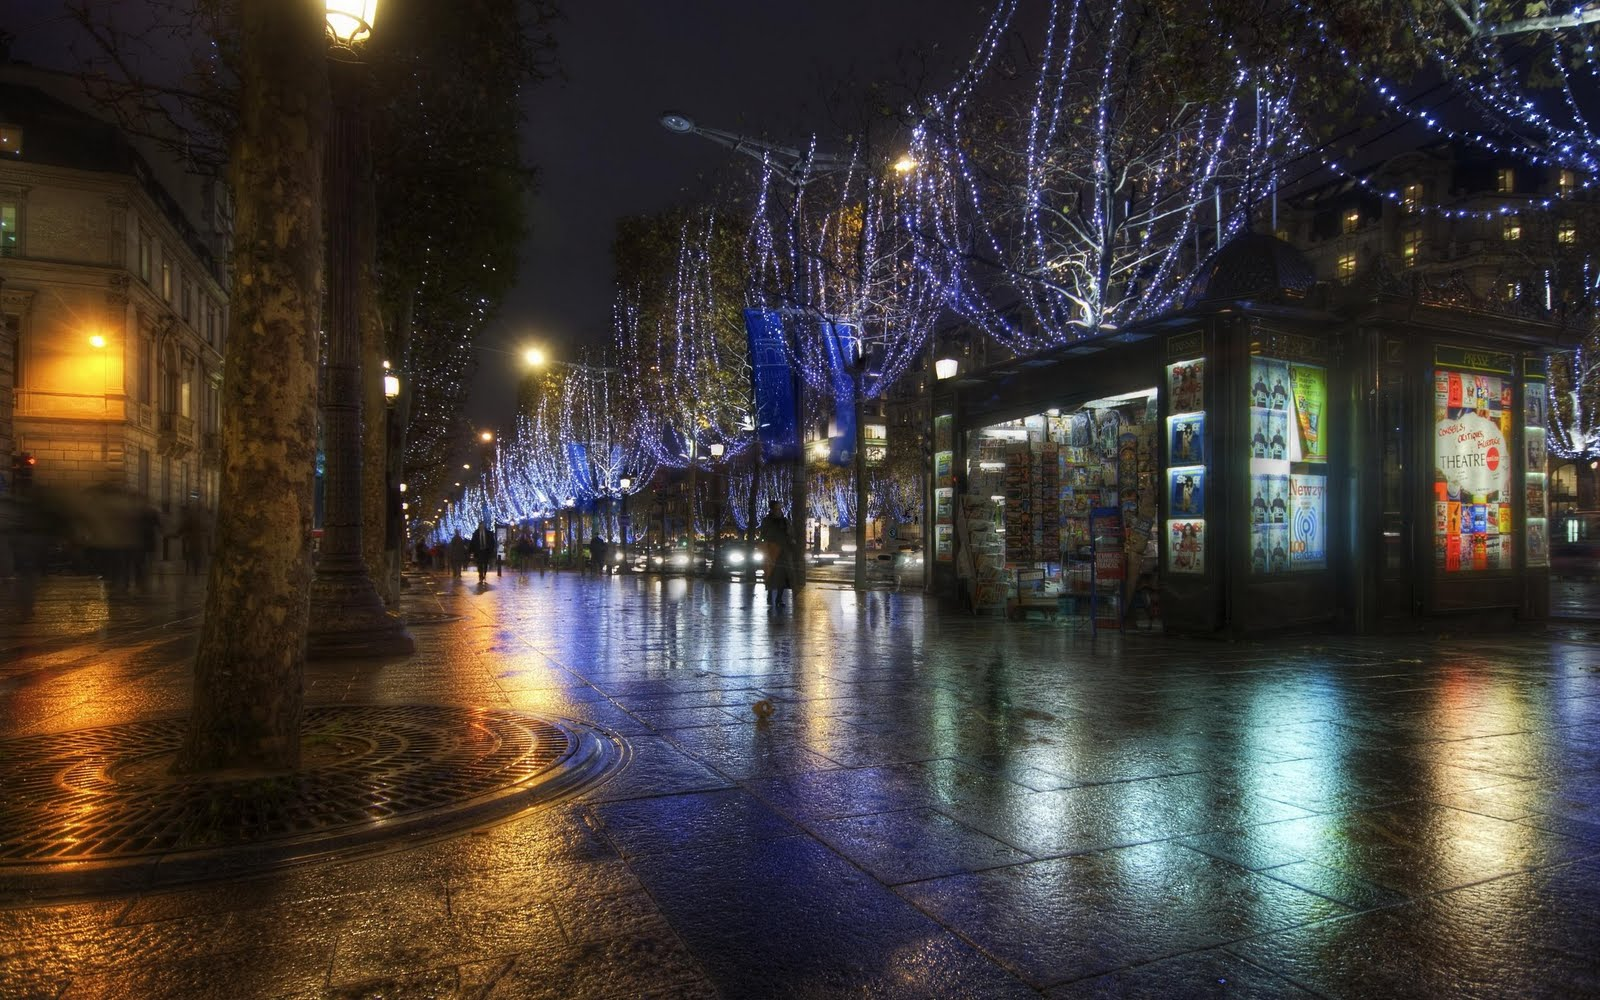 Festive Street